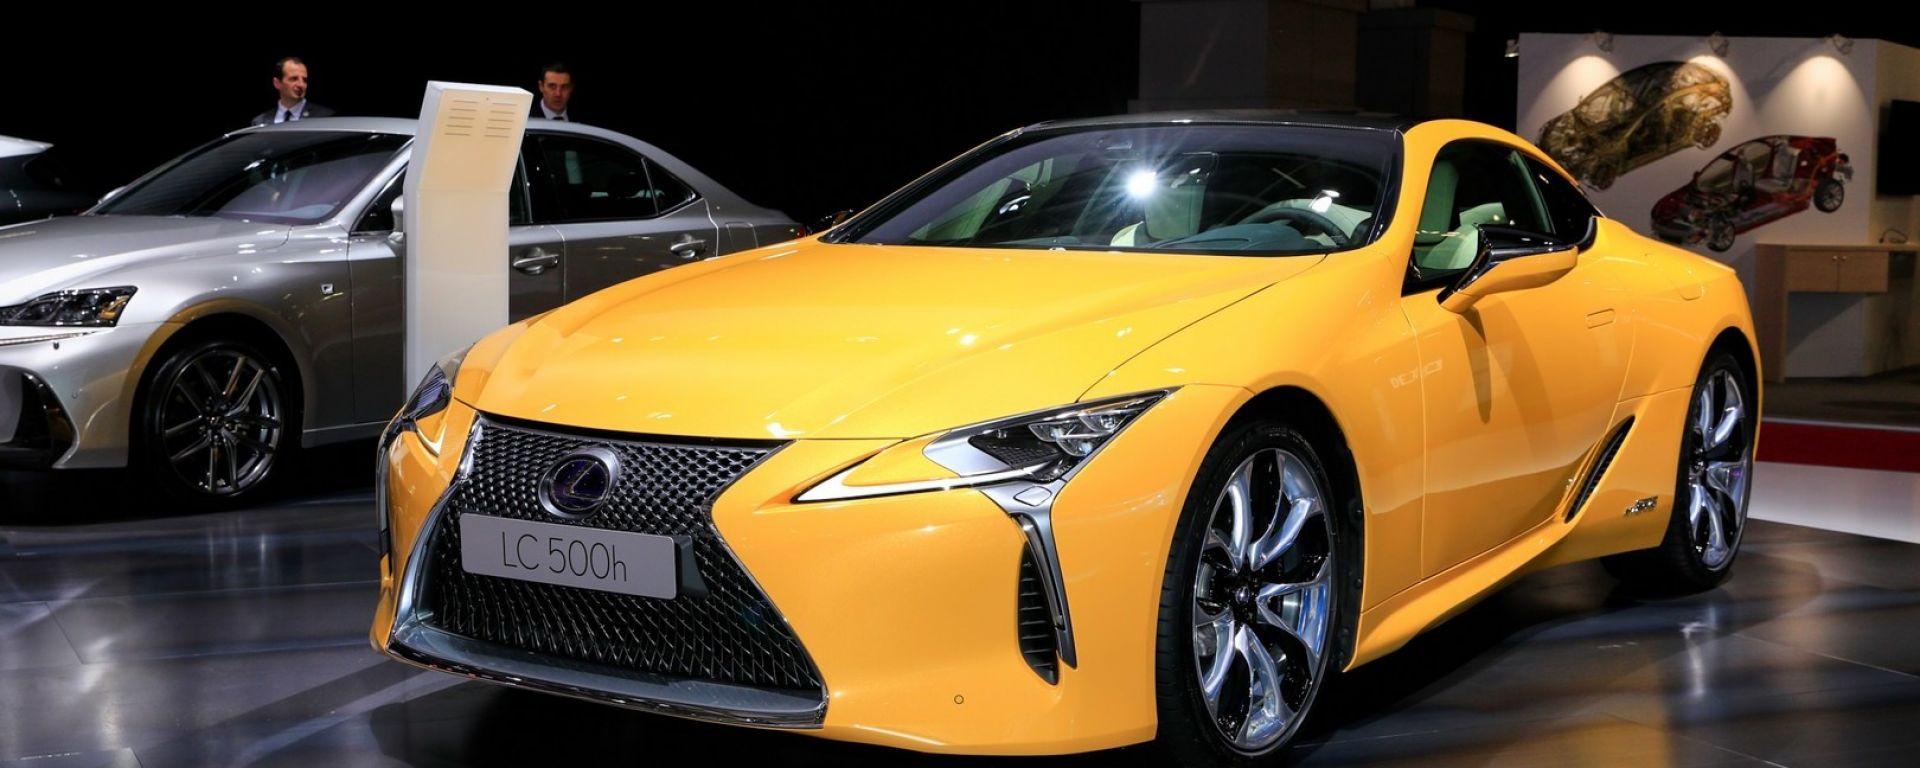 Lexus LC Hybrid Yellow Edition: le foto live da Parigi 2018